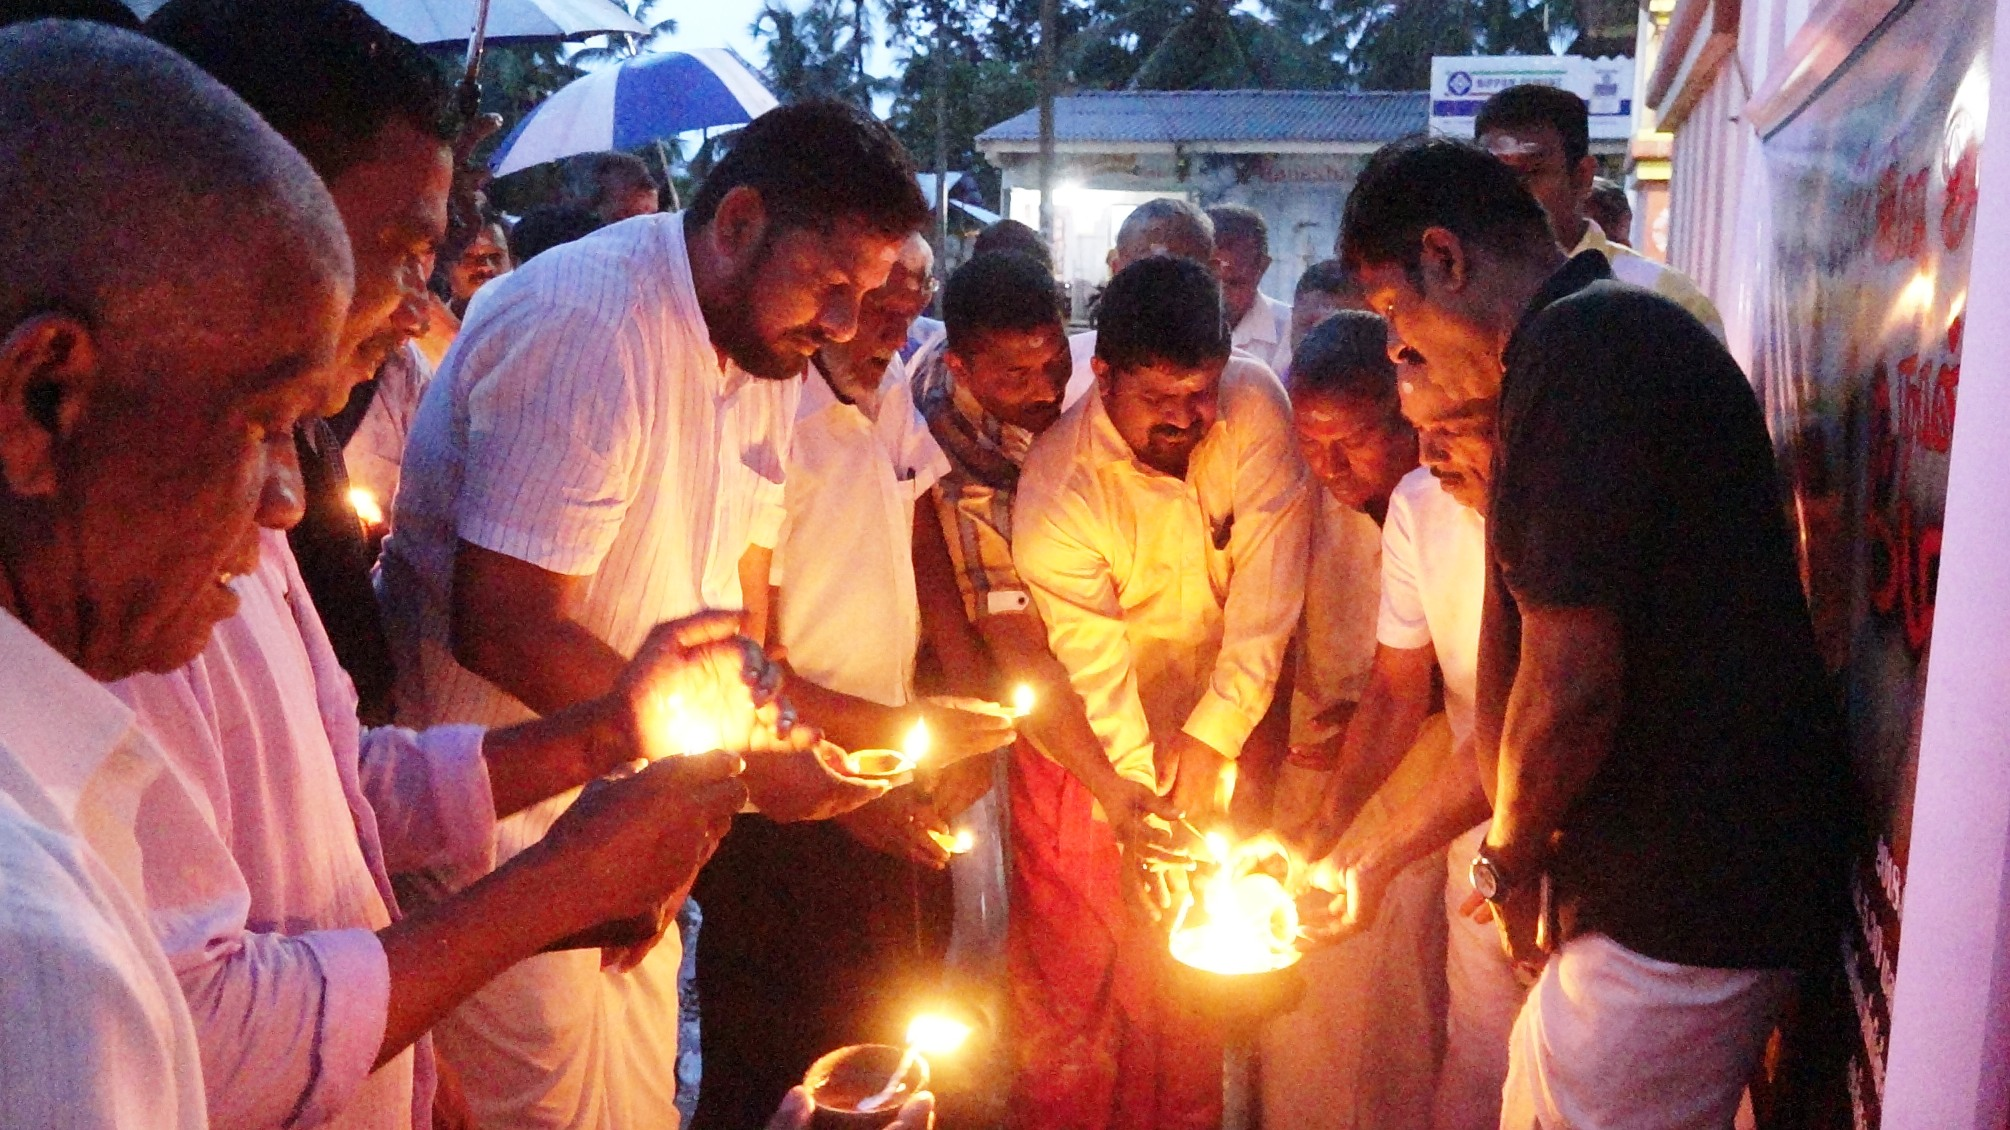 Vavuniya remembers massacre at Mullivaikkal | Tamil Guardian